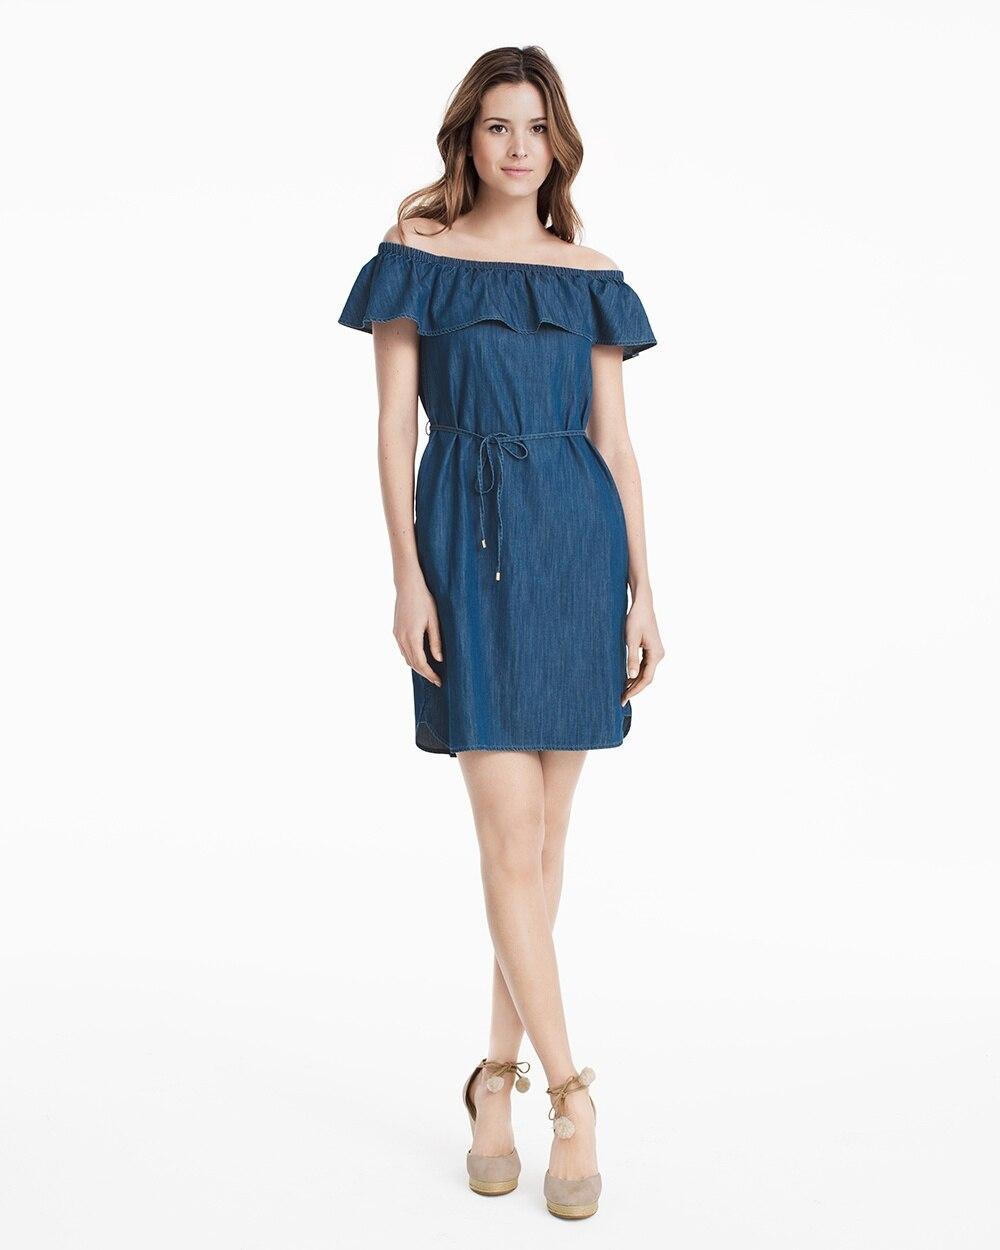 6595d9d3dcd0 Denim Off-The-Shoulder Shift Dress - White House Black Market